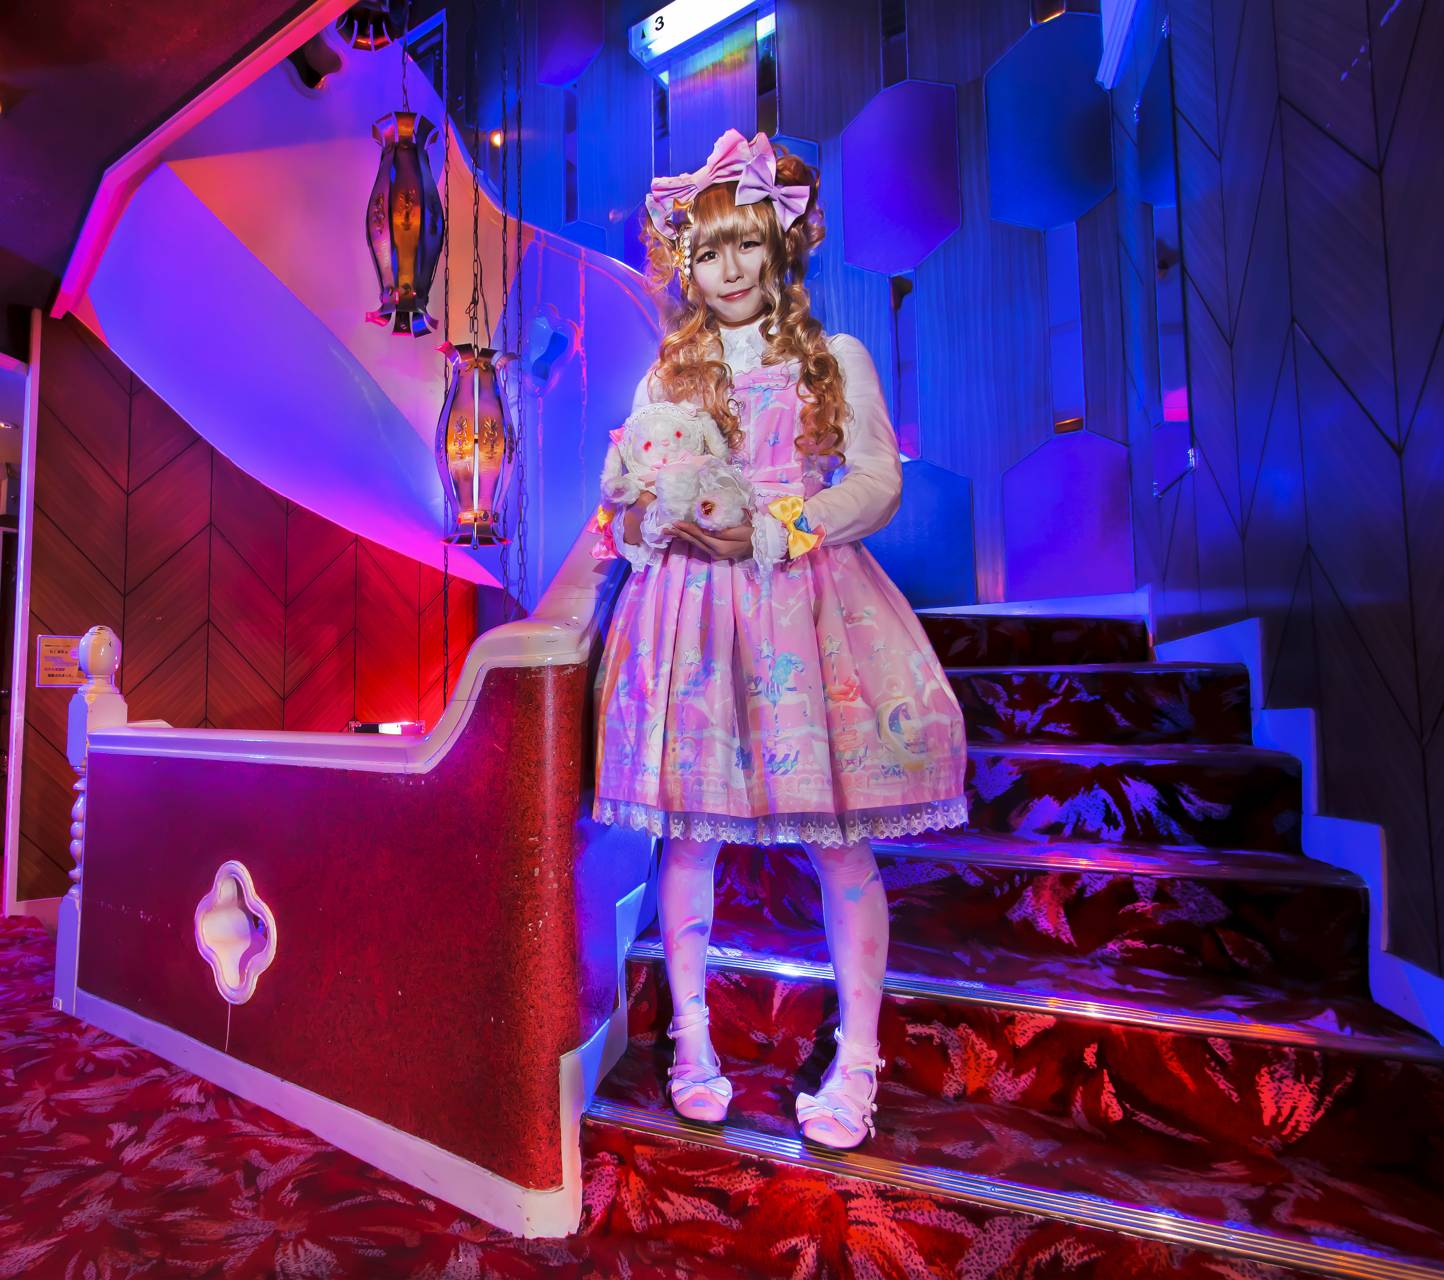 Lolita On Stairs